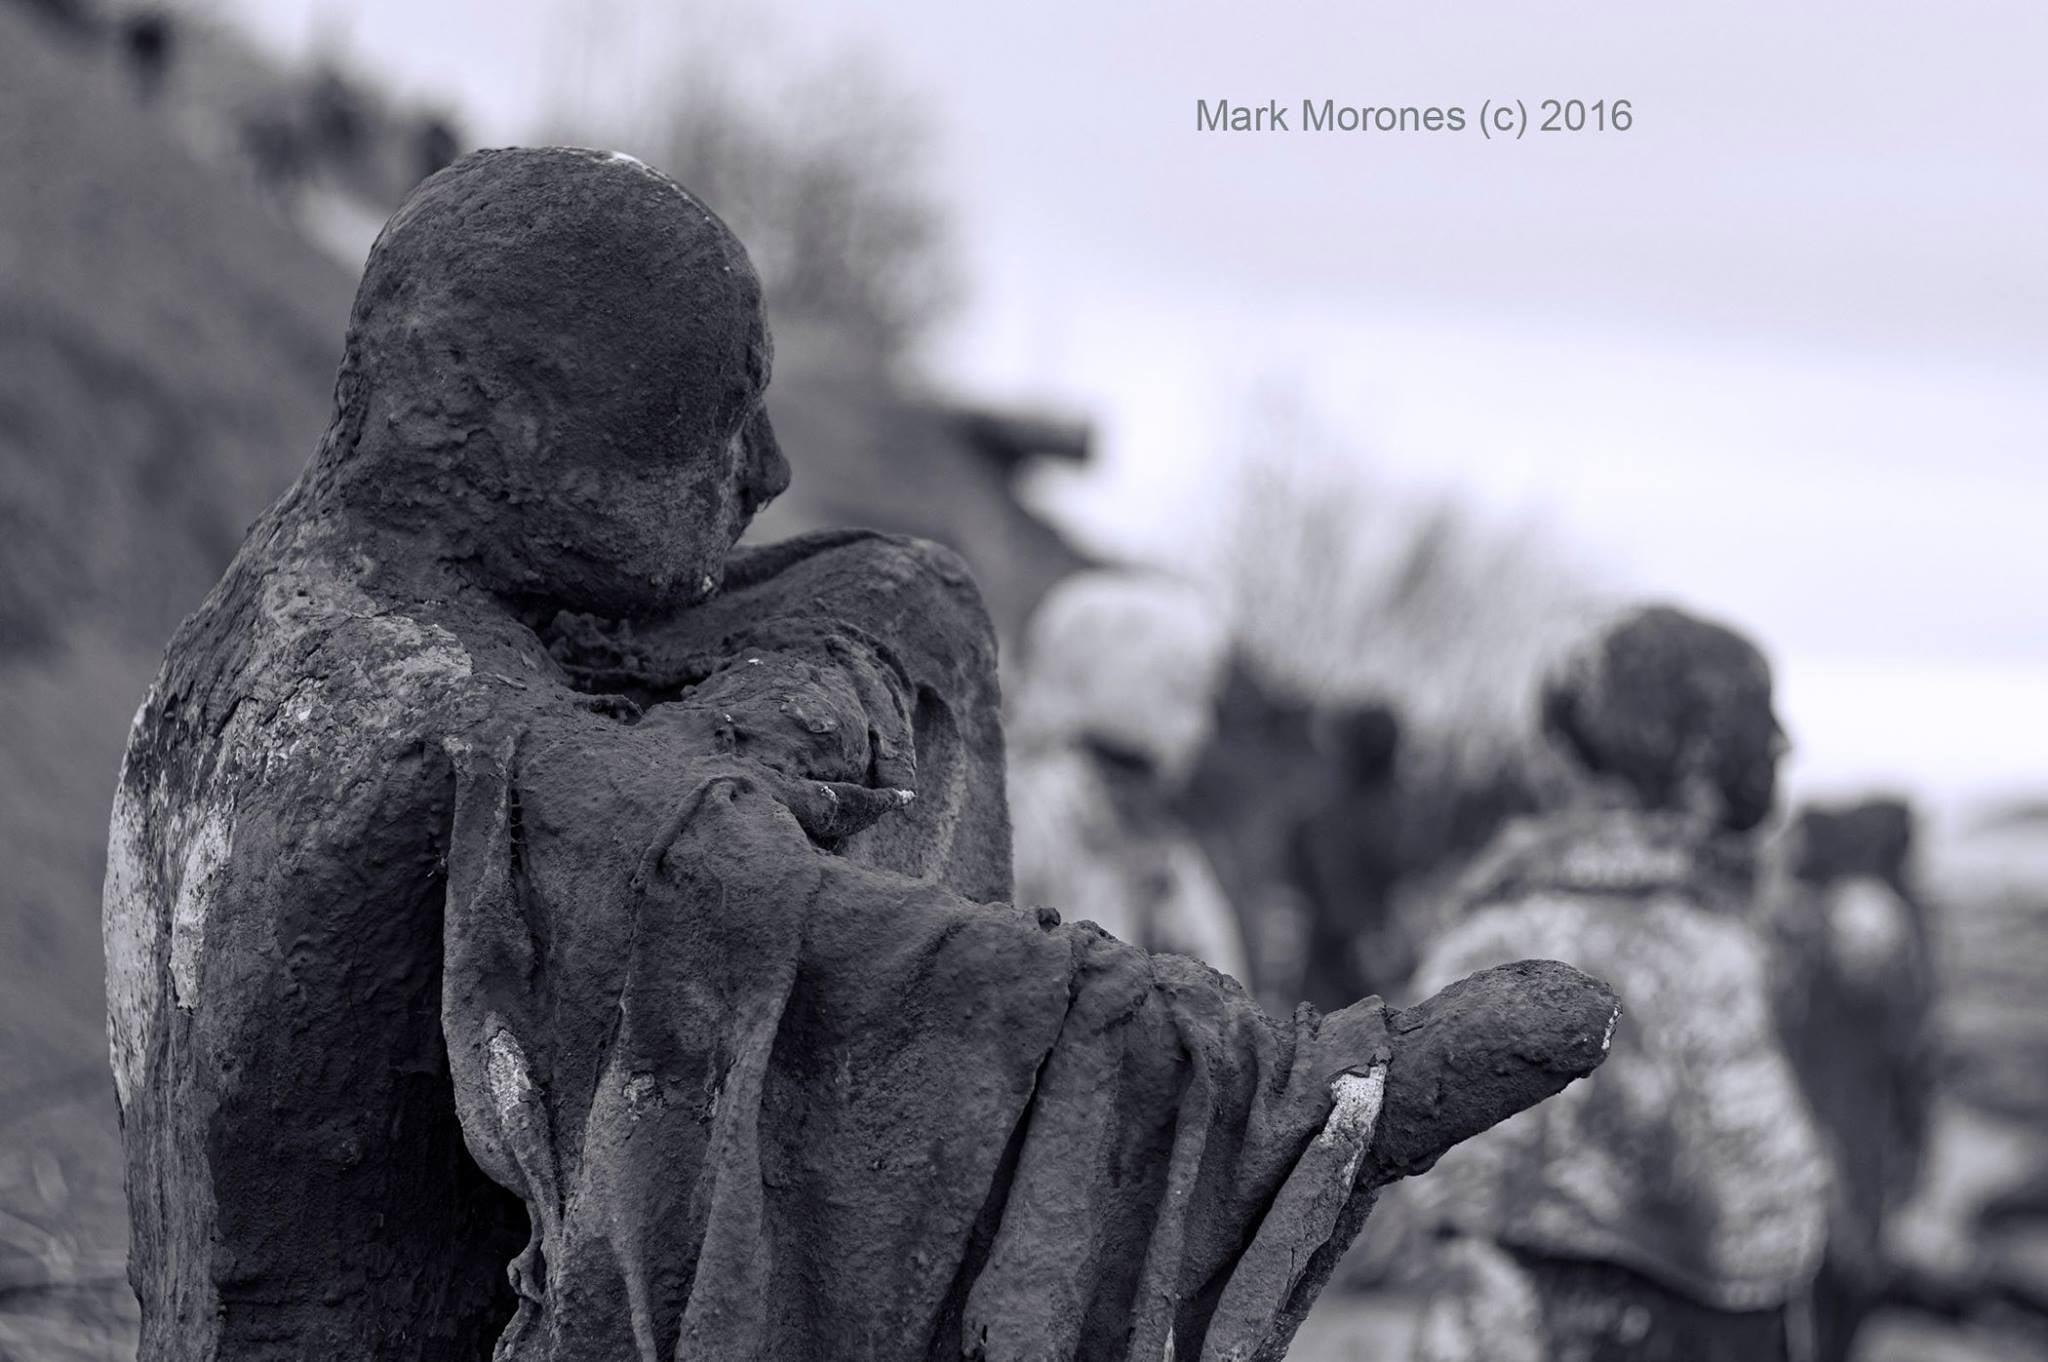 MarkMorones_3.jpg